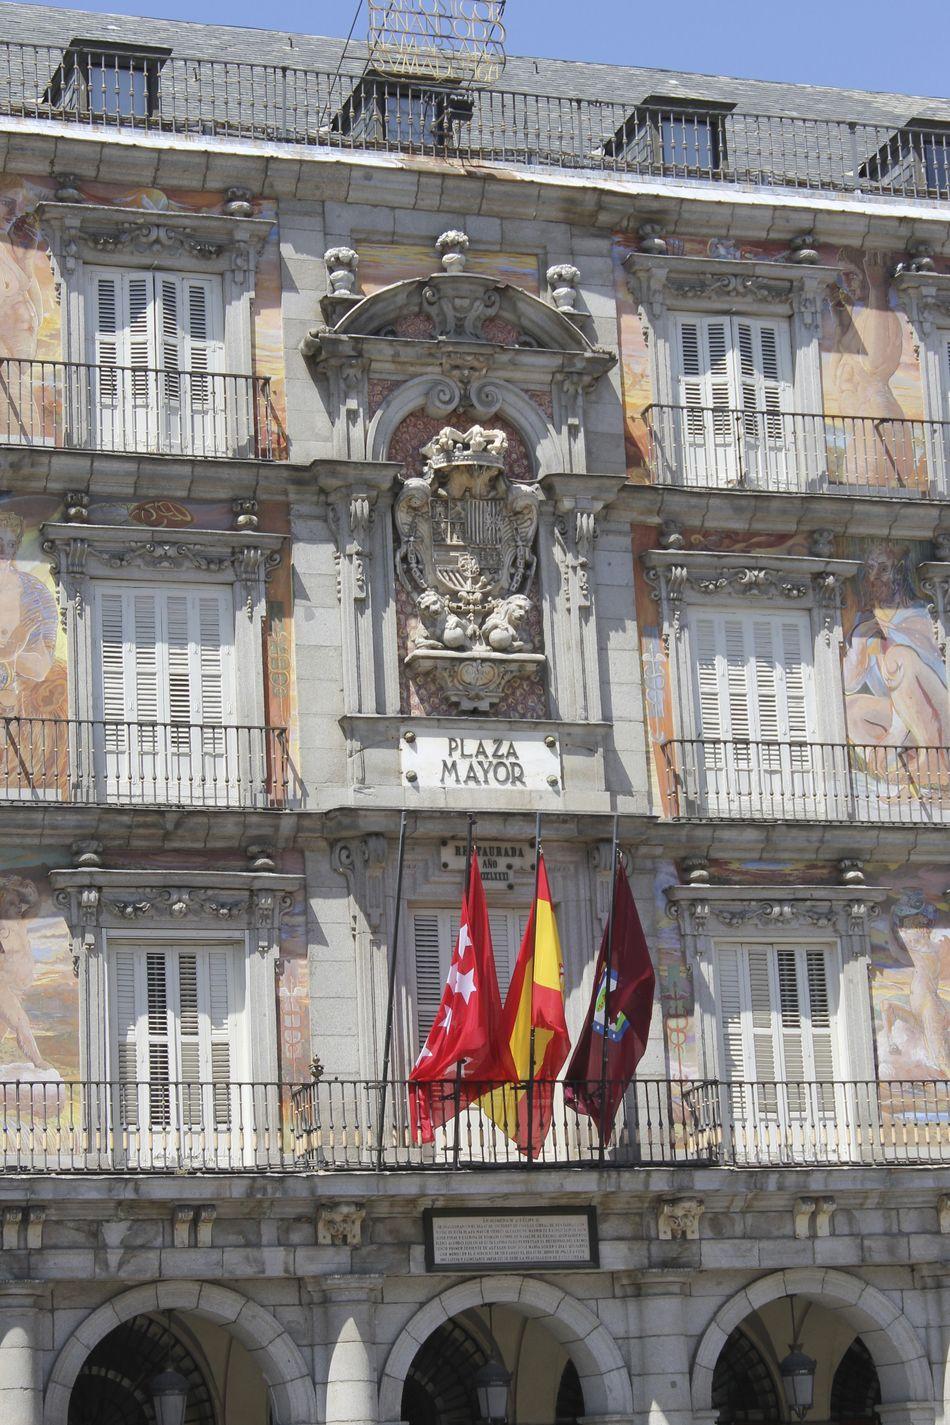 Plaza mayor Architecture Culture Façade Fachadas Bonitas Fachadas De Madrid Famous Place Historic Plazamayor Tourism Travel Destinations